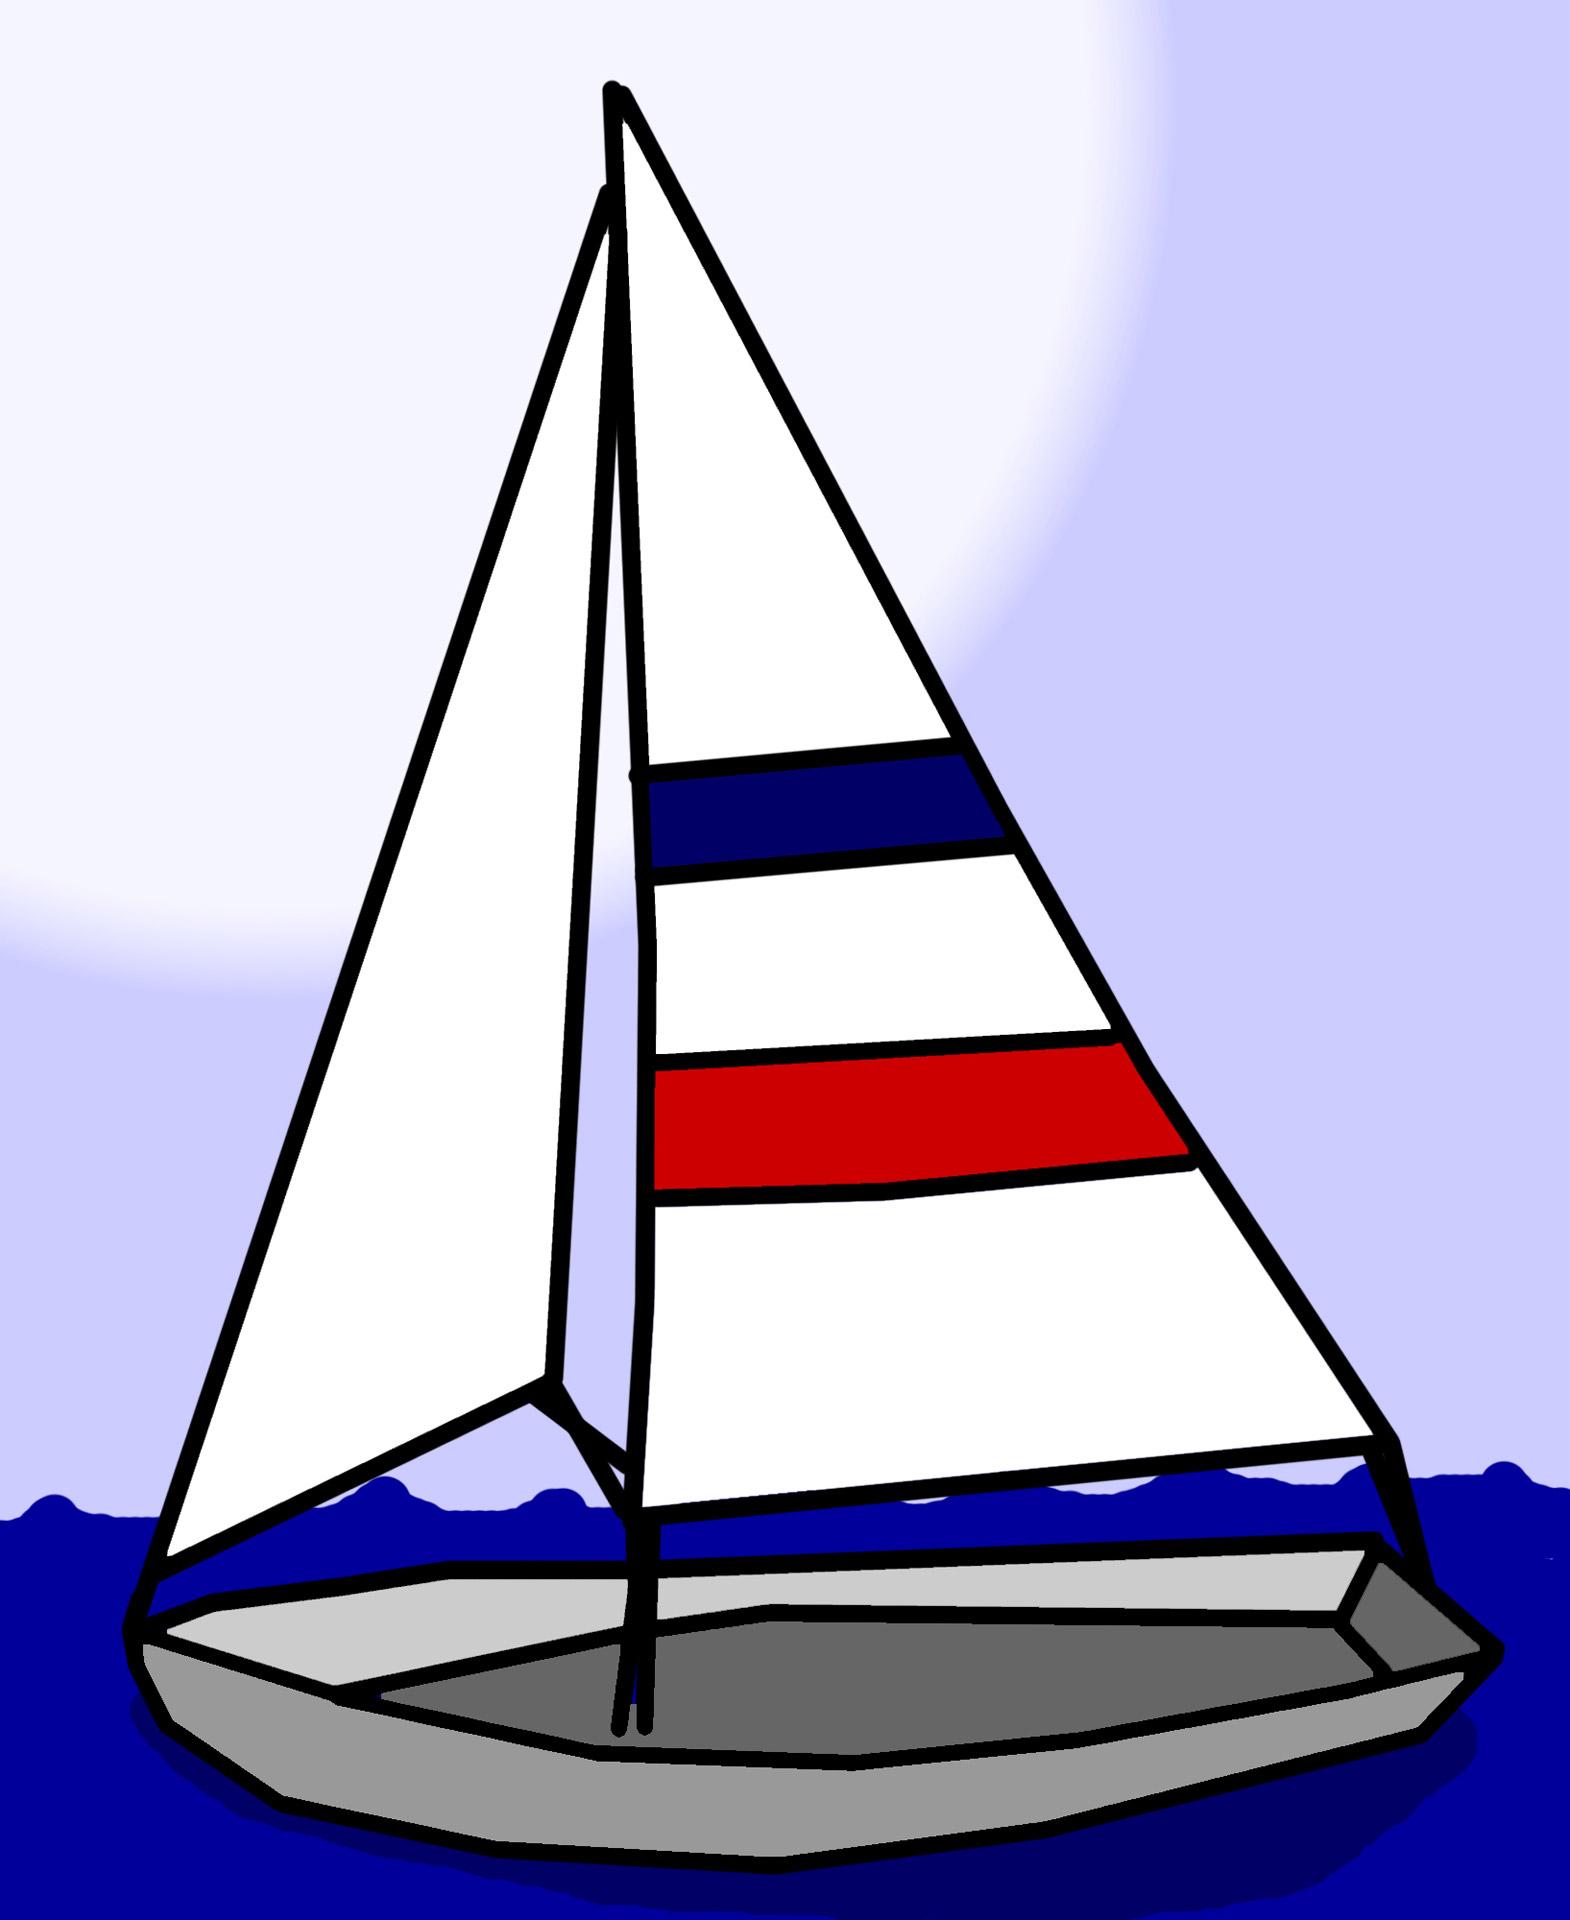 1570x1920 Sailboat Clipart 0 Sailboat Boat Free Clip Art 2 2